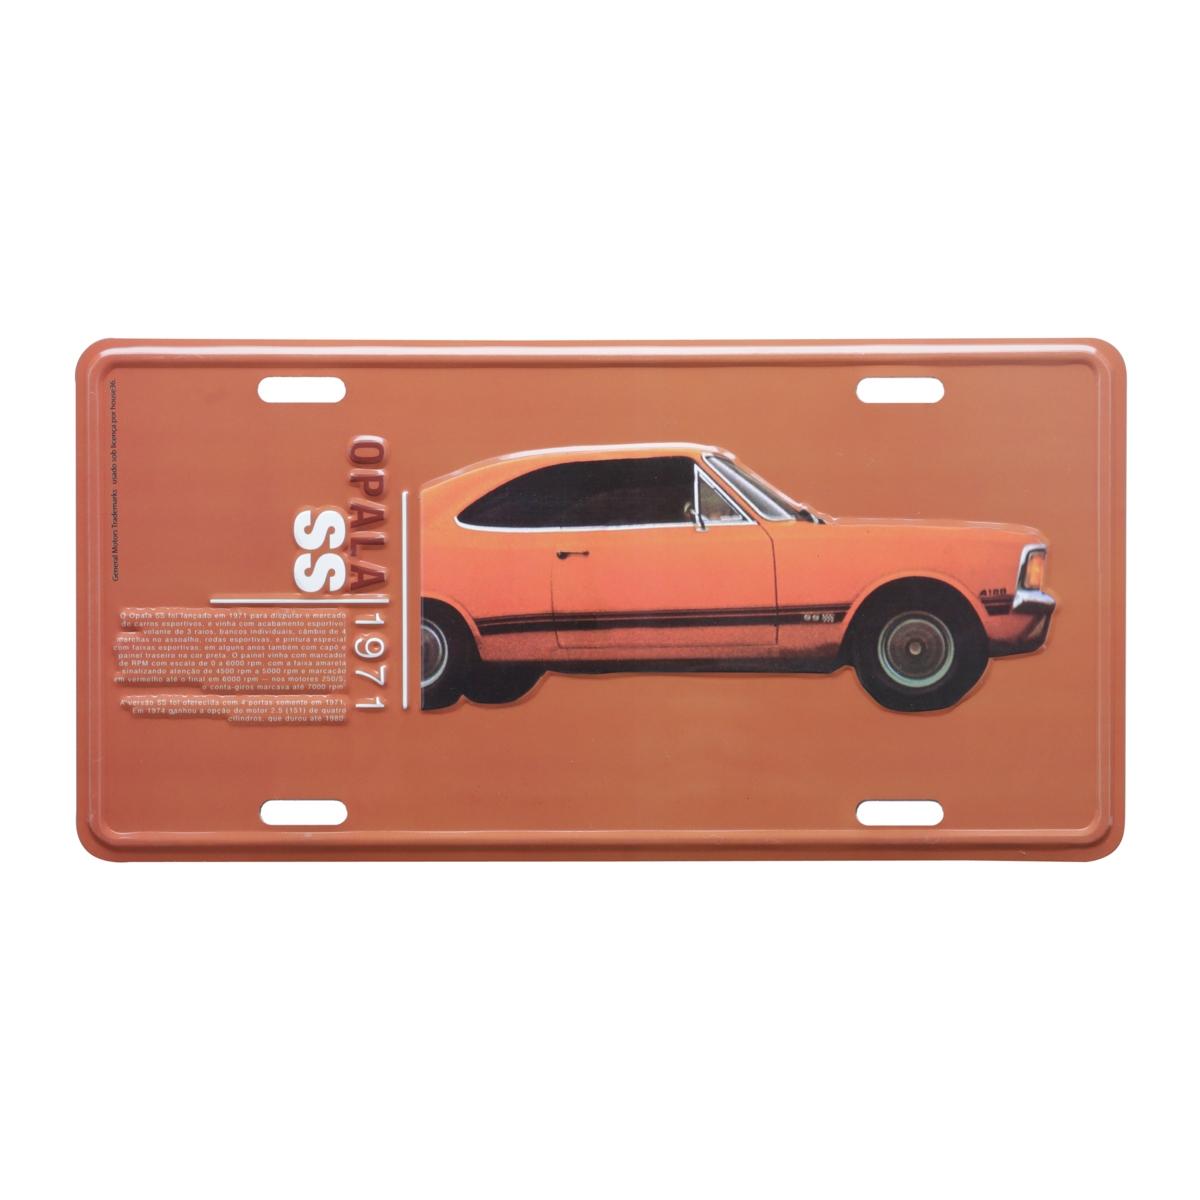 Placa de Alumínio Chevrolet - Opala 1971 - Laranja